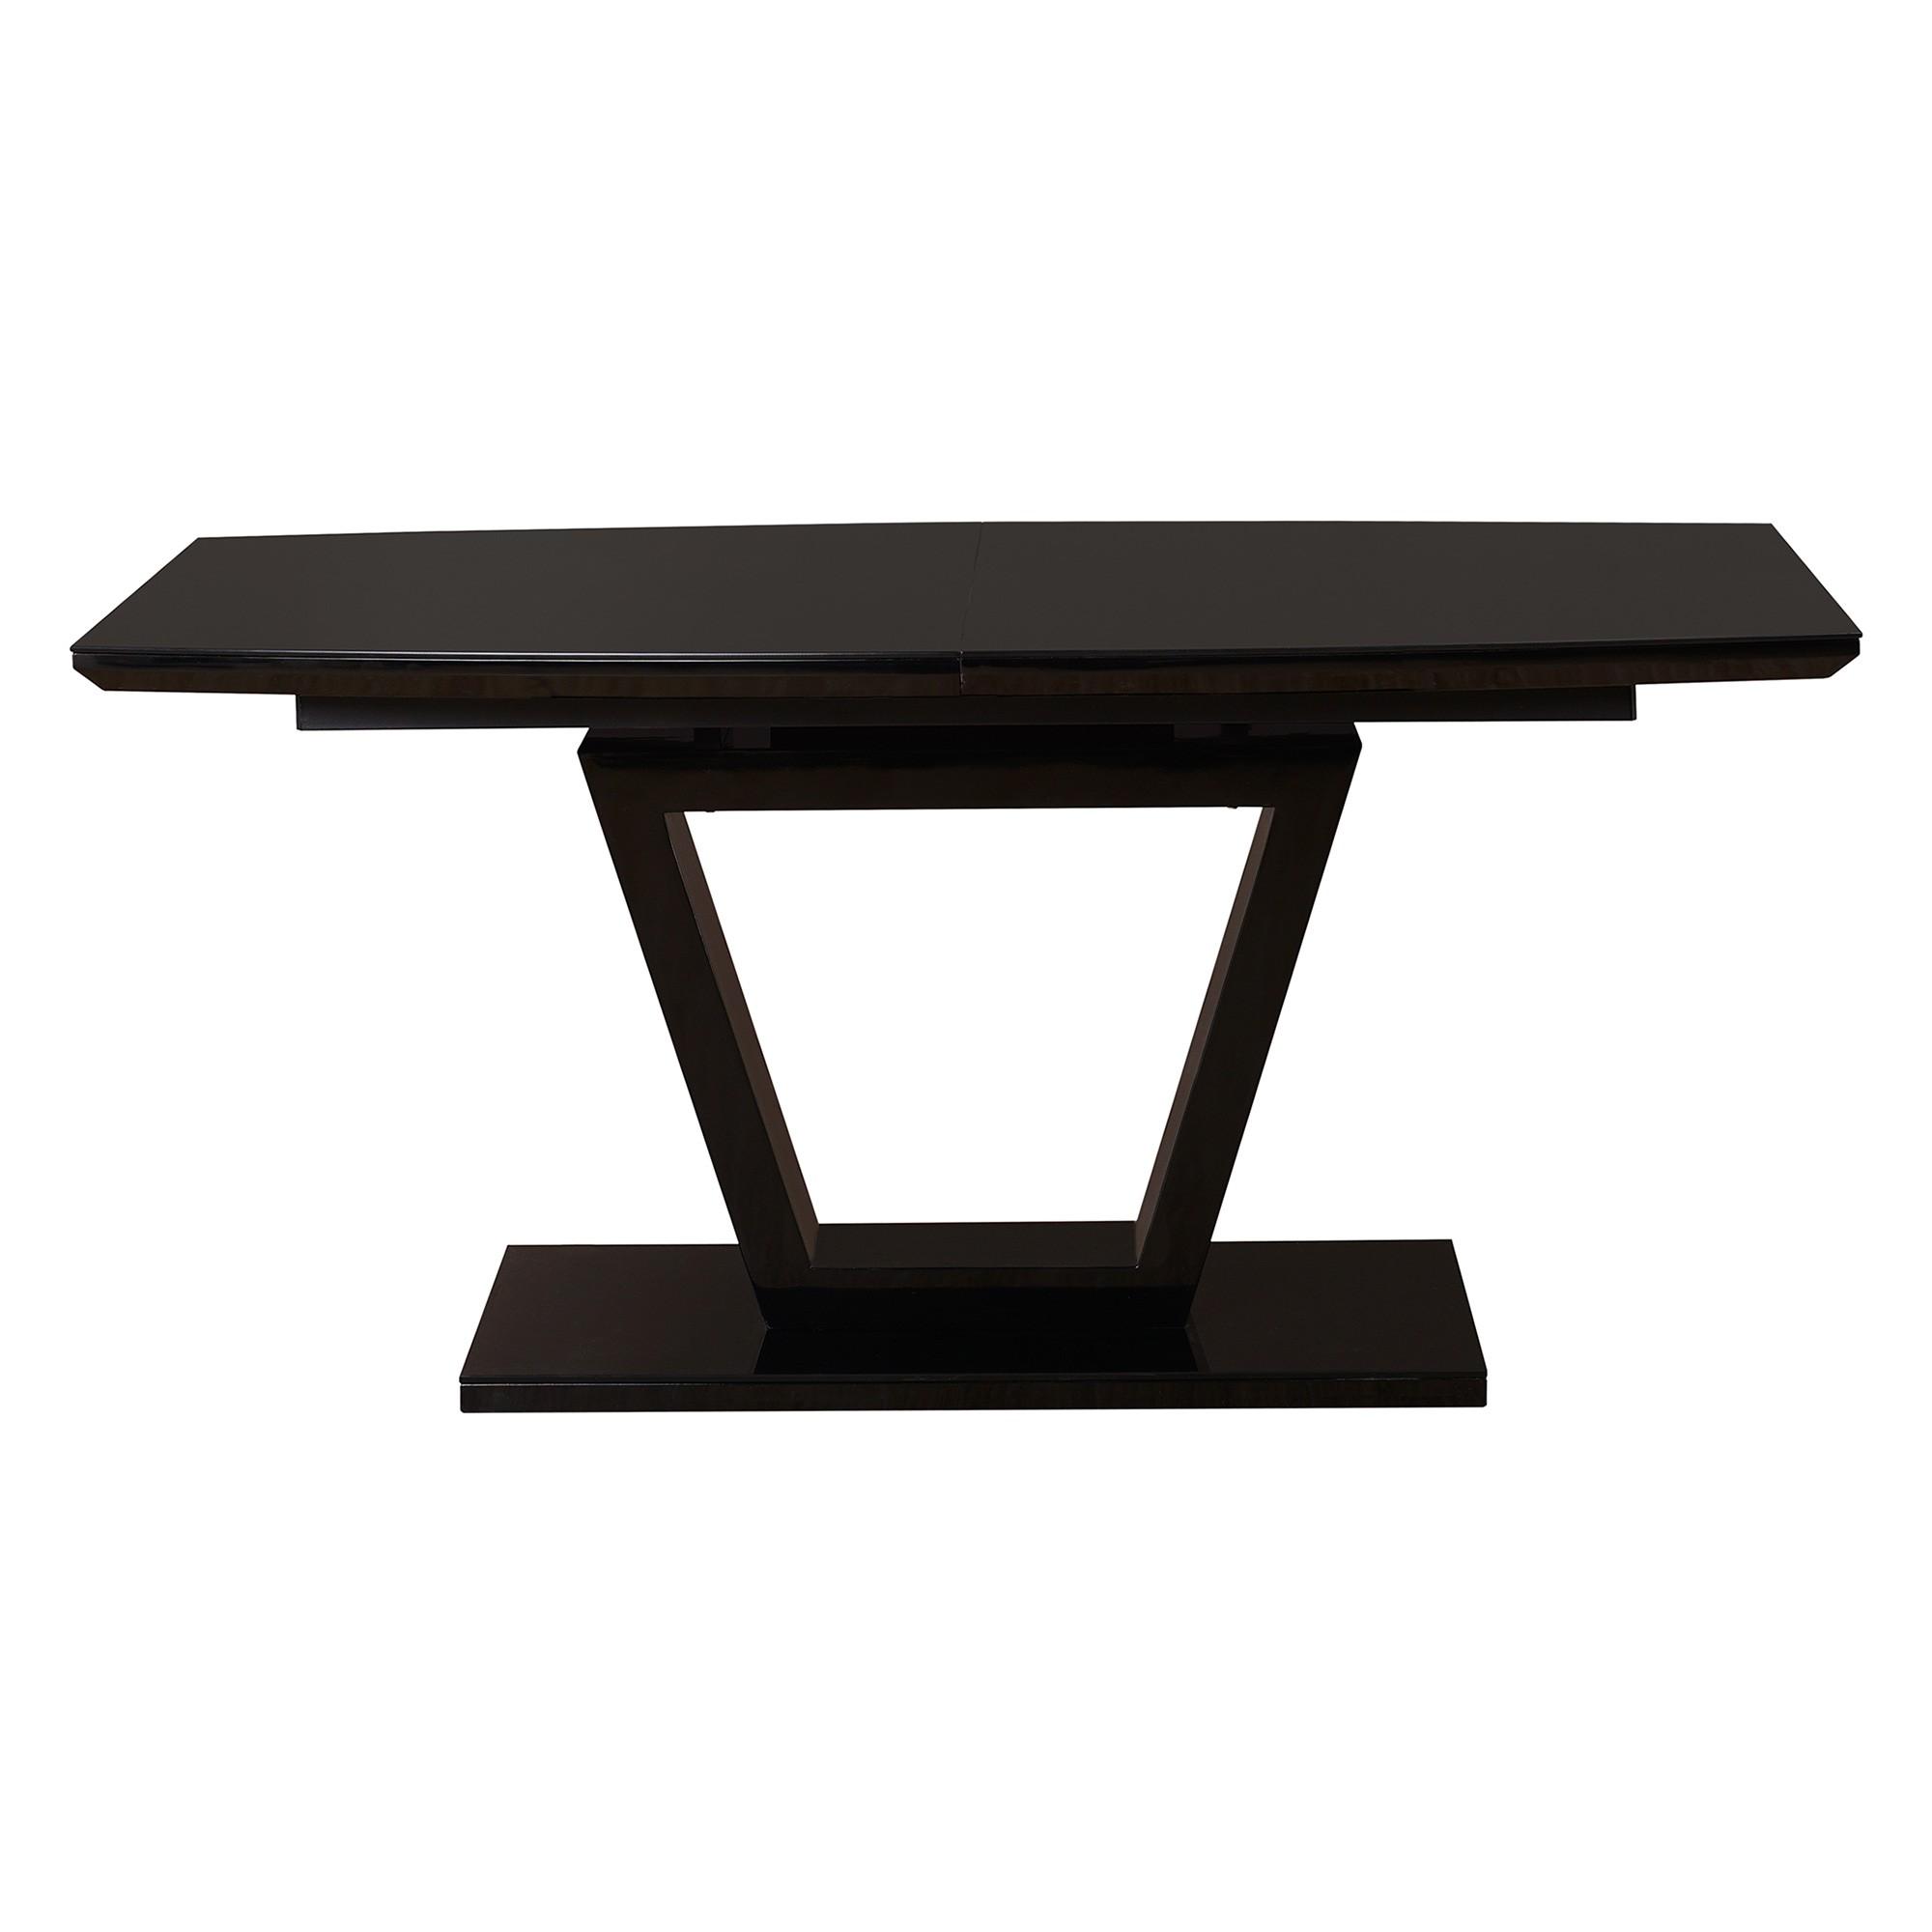 Henri High Gloss Extension Dining Table, 160-200cm, Black